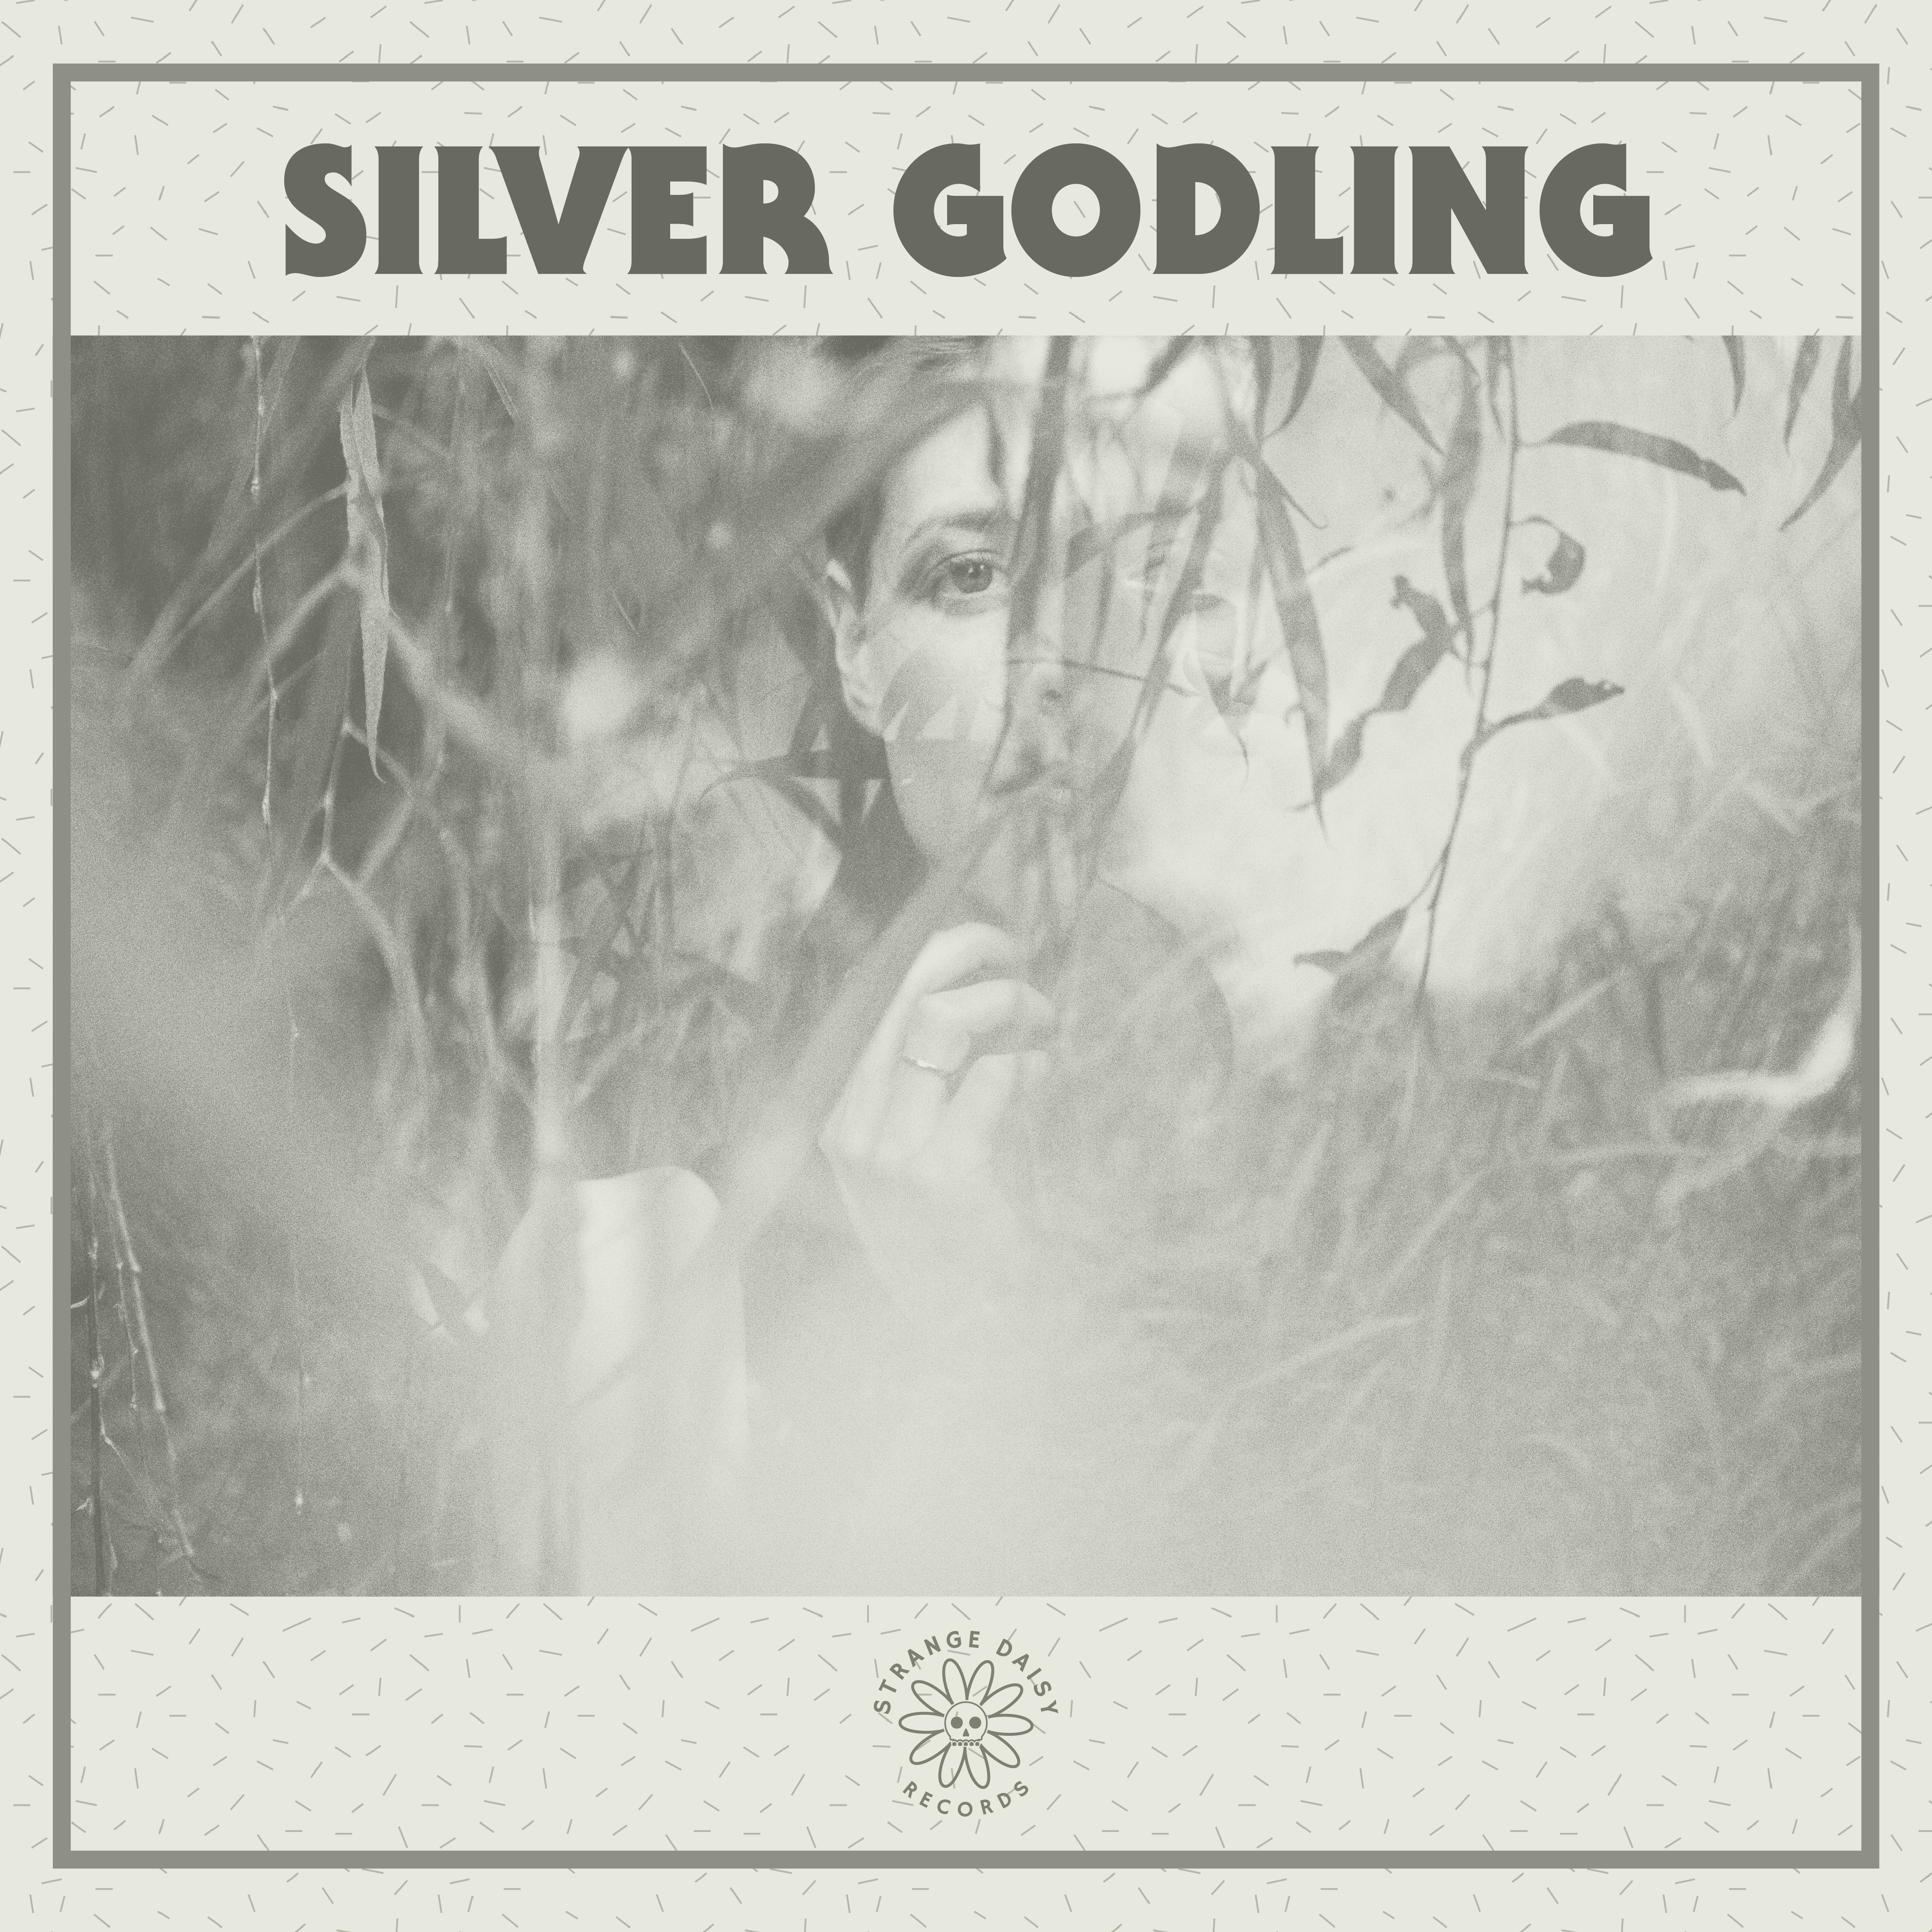 Silver Godling